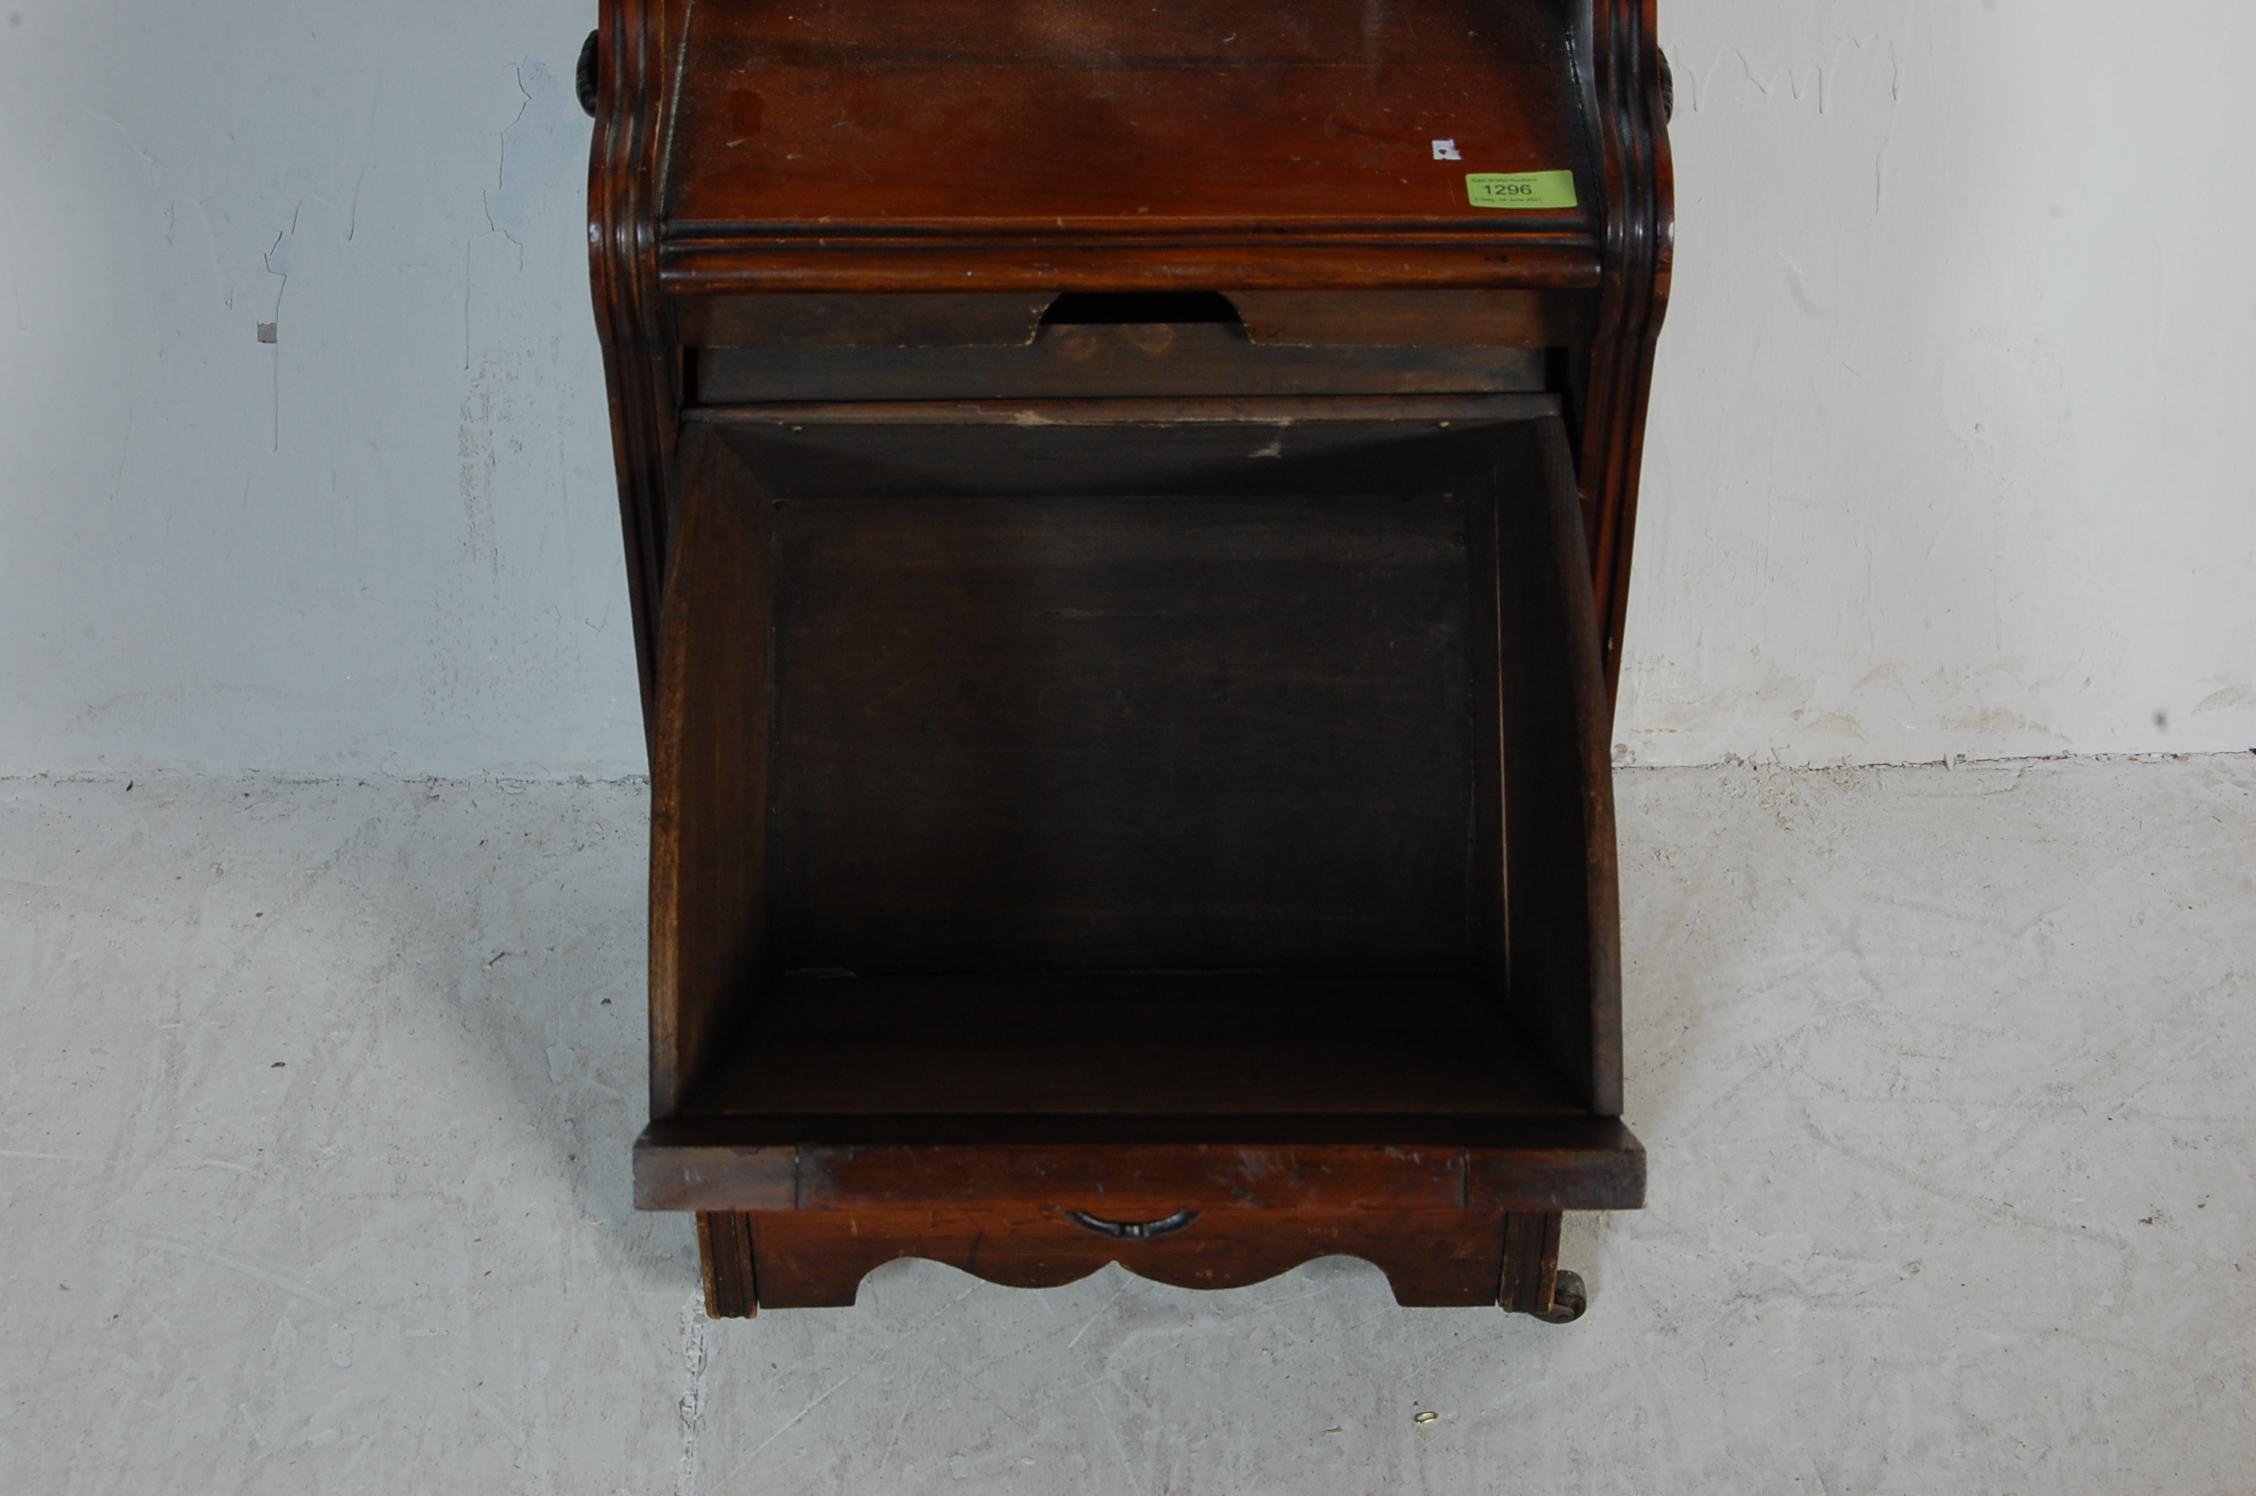 19TH CENTURY VICTORIAN MAHOGANY PURDONIUM COAL SCUTTLE - Image 4 of 5